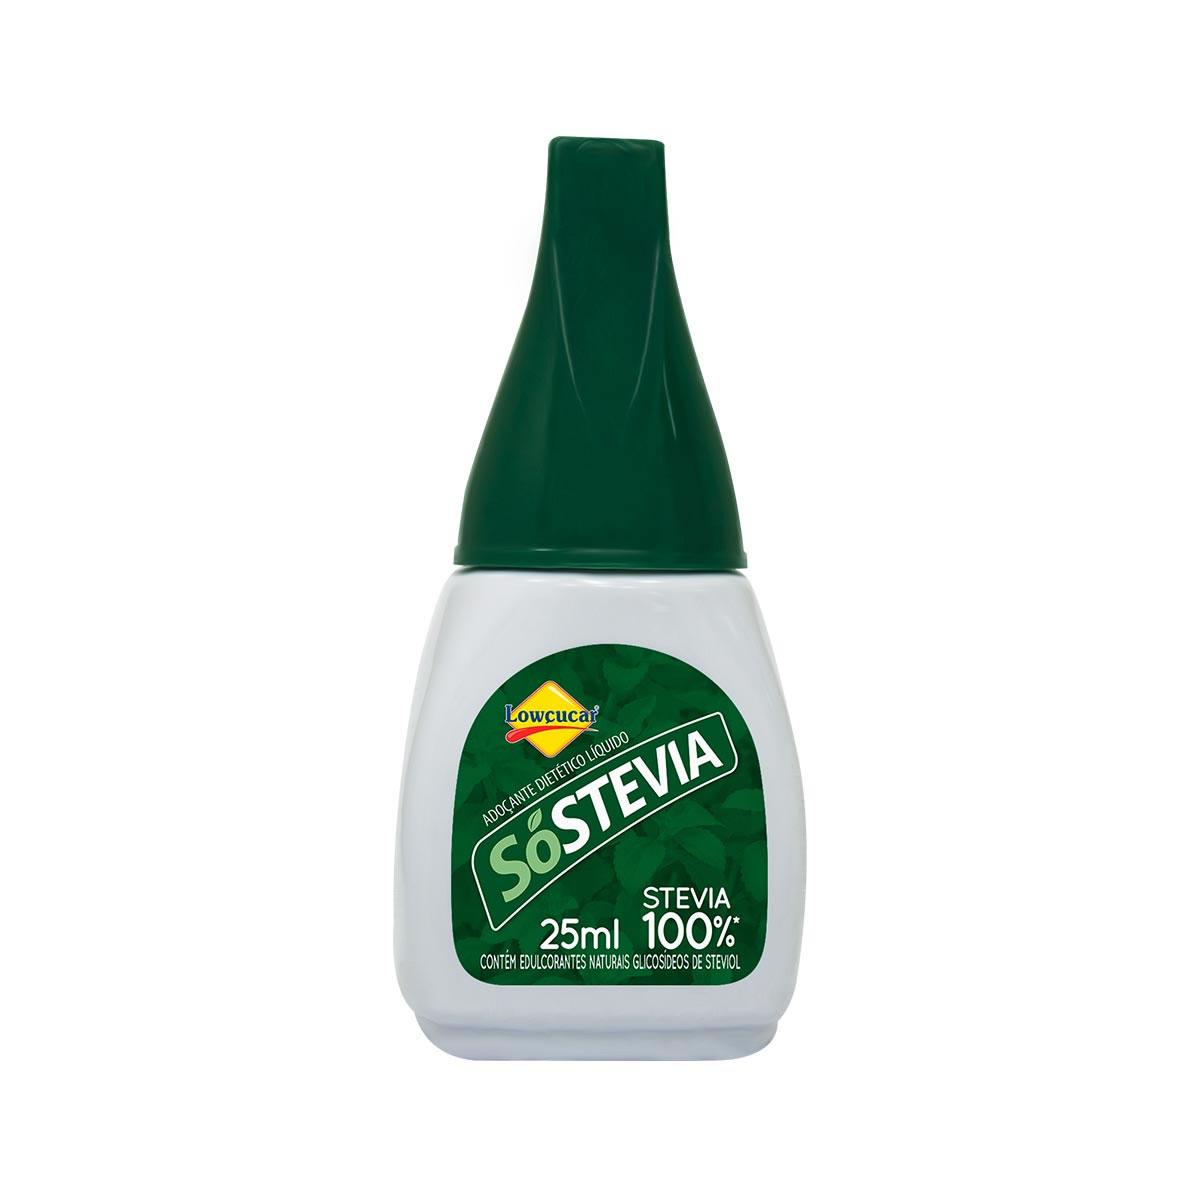 Adoçante 100% Stevia Liquido SóStevia 25ml - Lowçucar